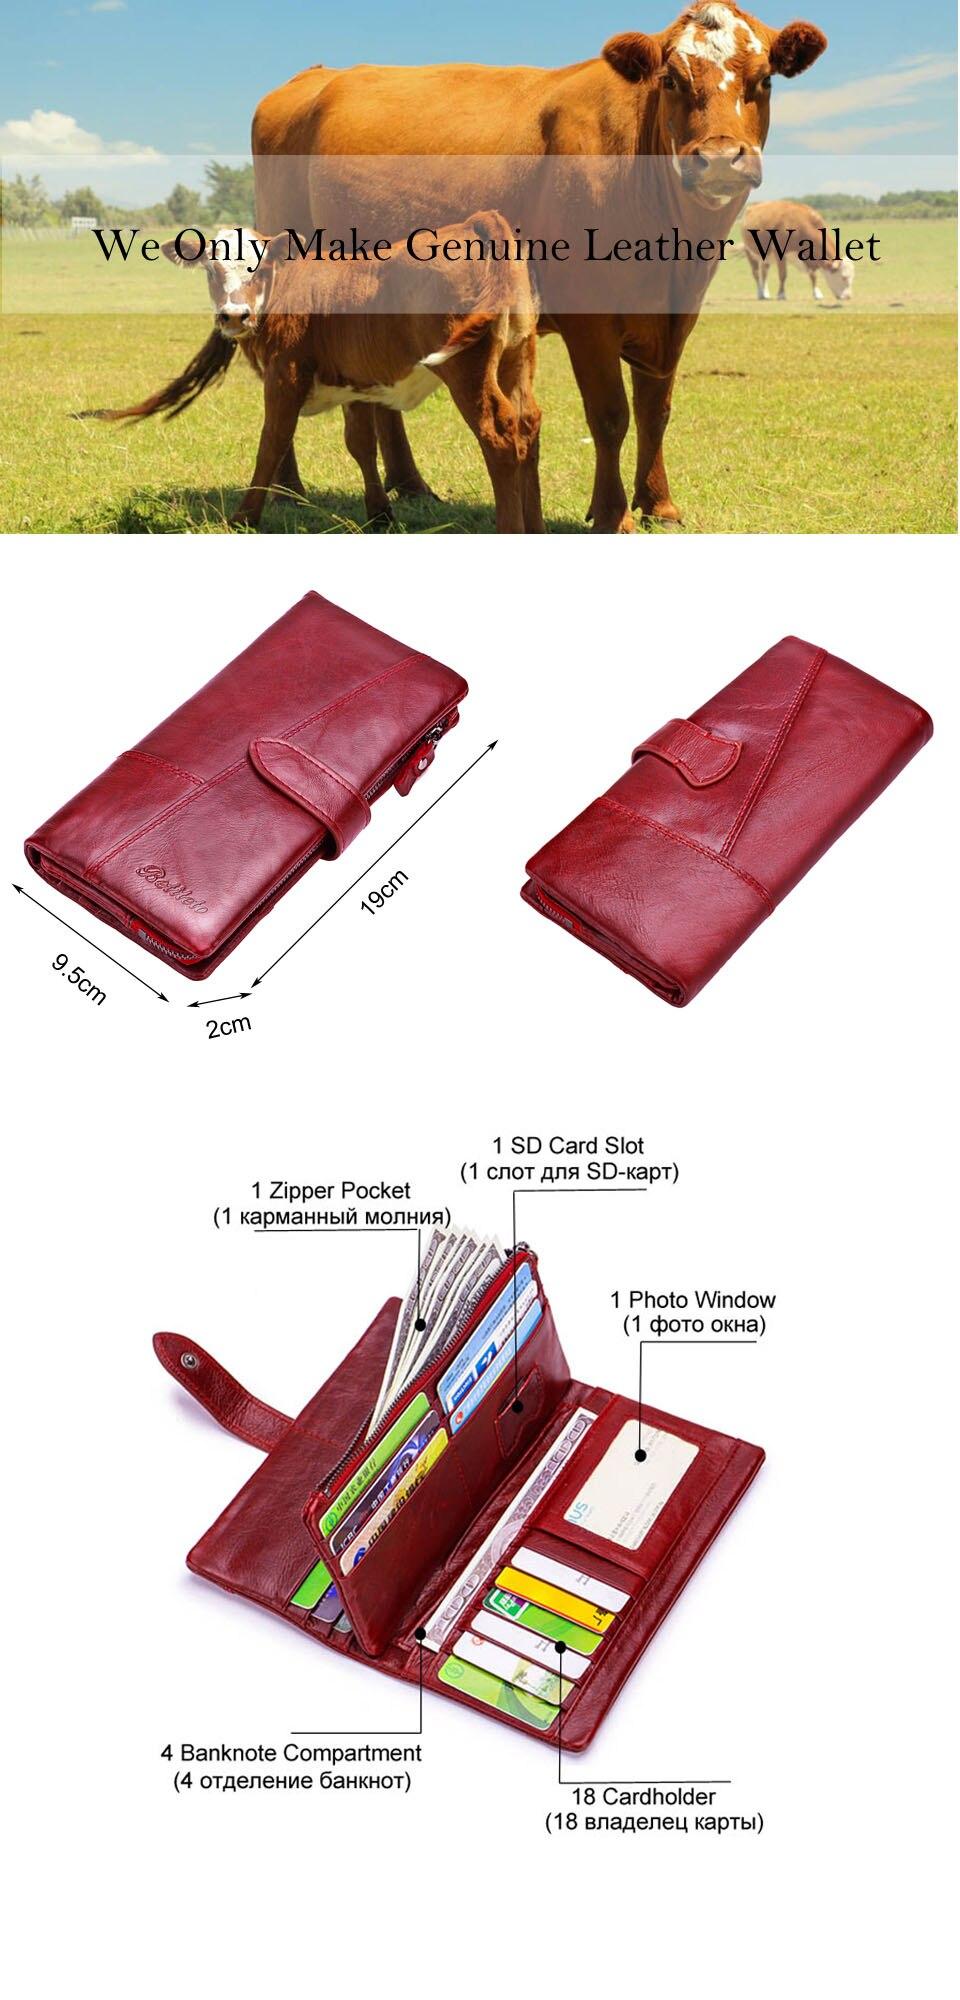 genuíno carteira feminina carteras embreagem portomonee partmone